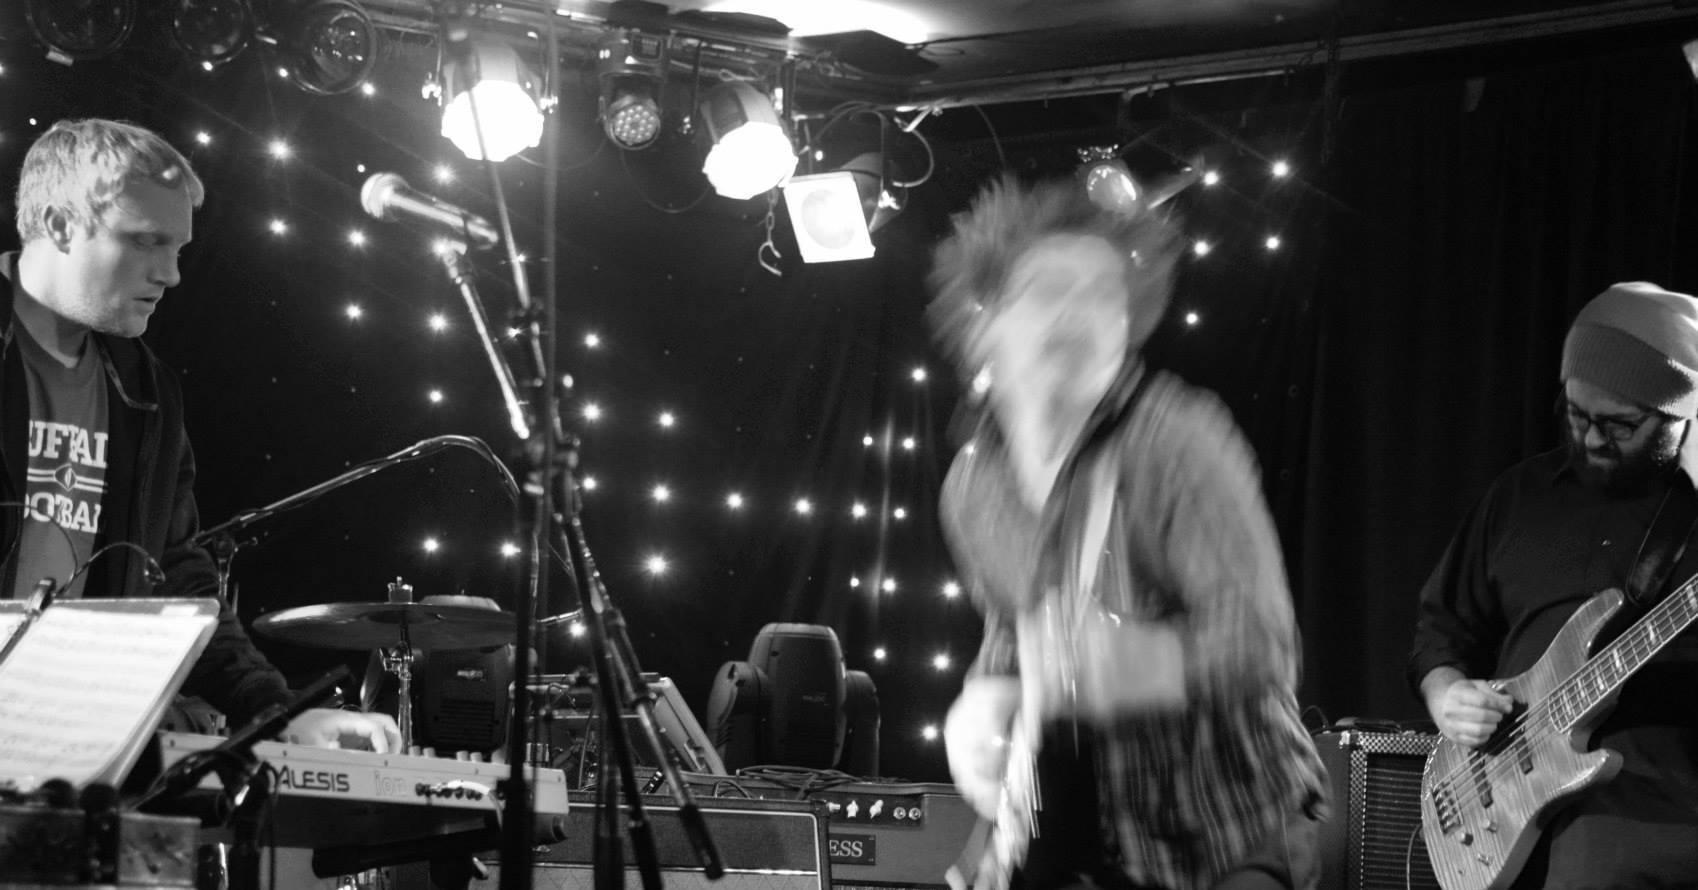 Lazlo Hollyfeld will perform Radiohead's 'In Rainbows' at Buffalo Iron Works on May 20.